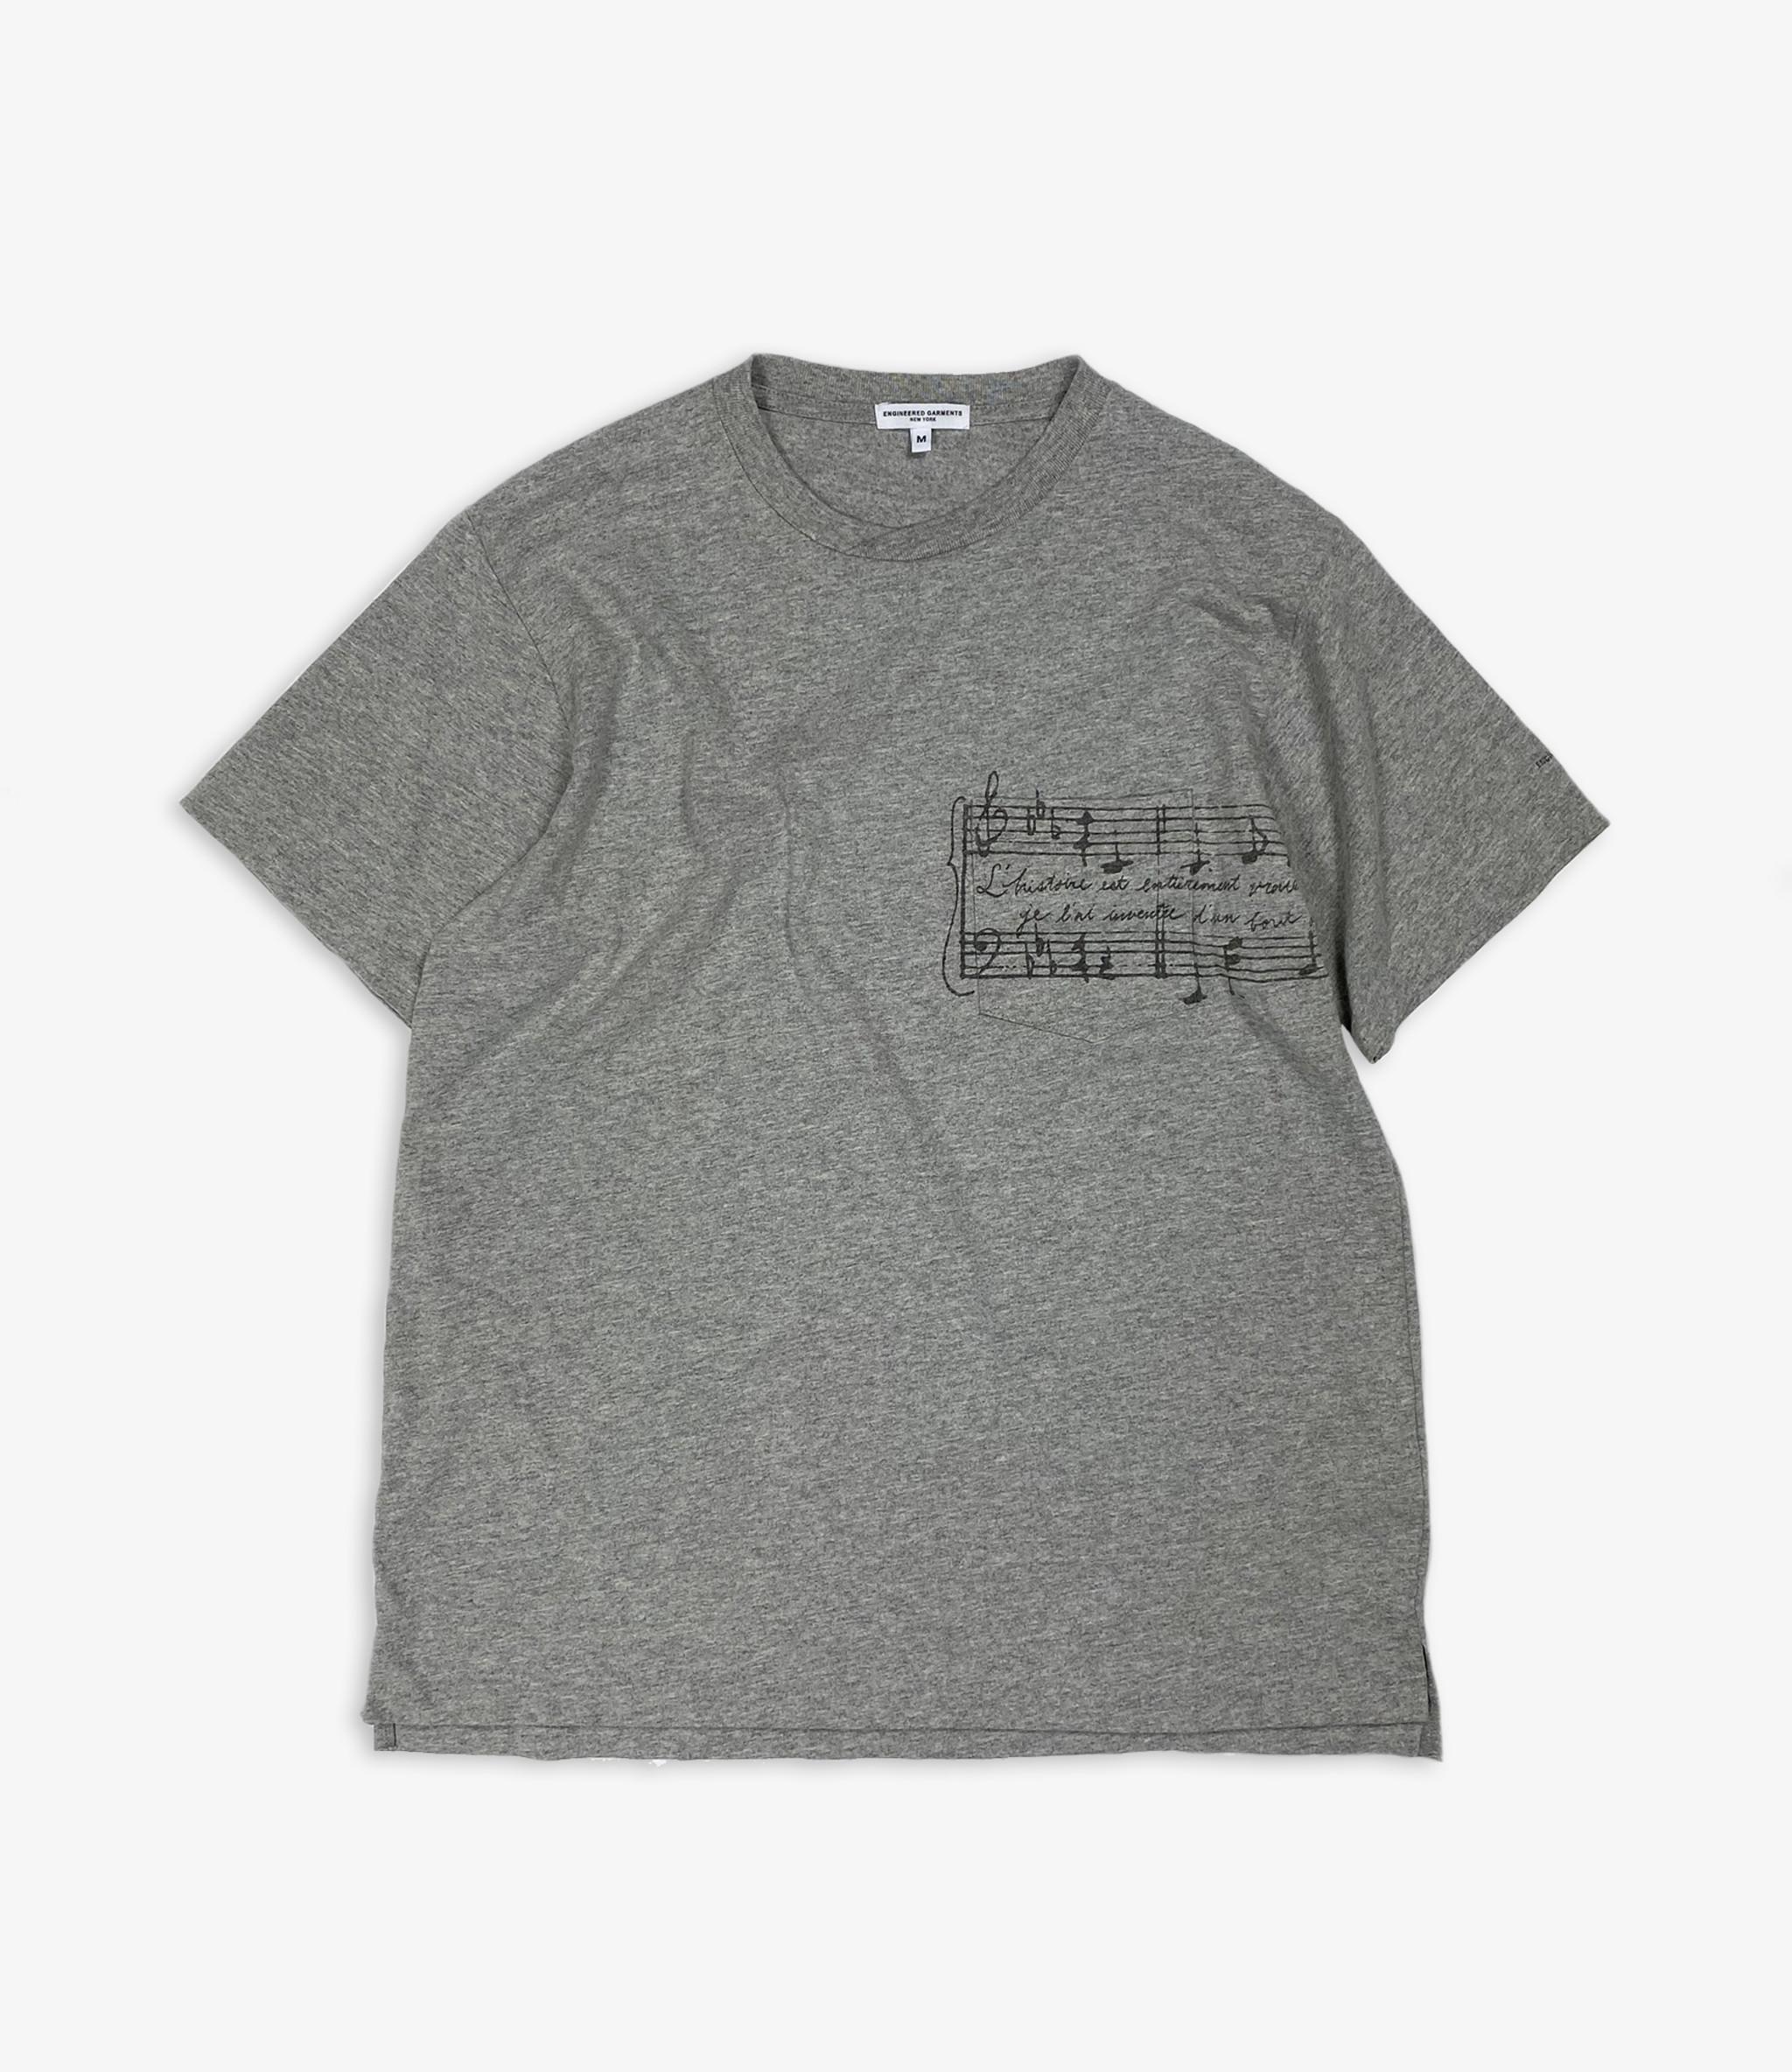 Engineered Garments Printed Cross Crew Neck T-shirt - Grey - Music